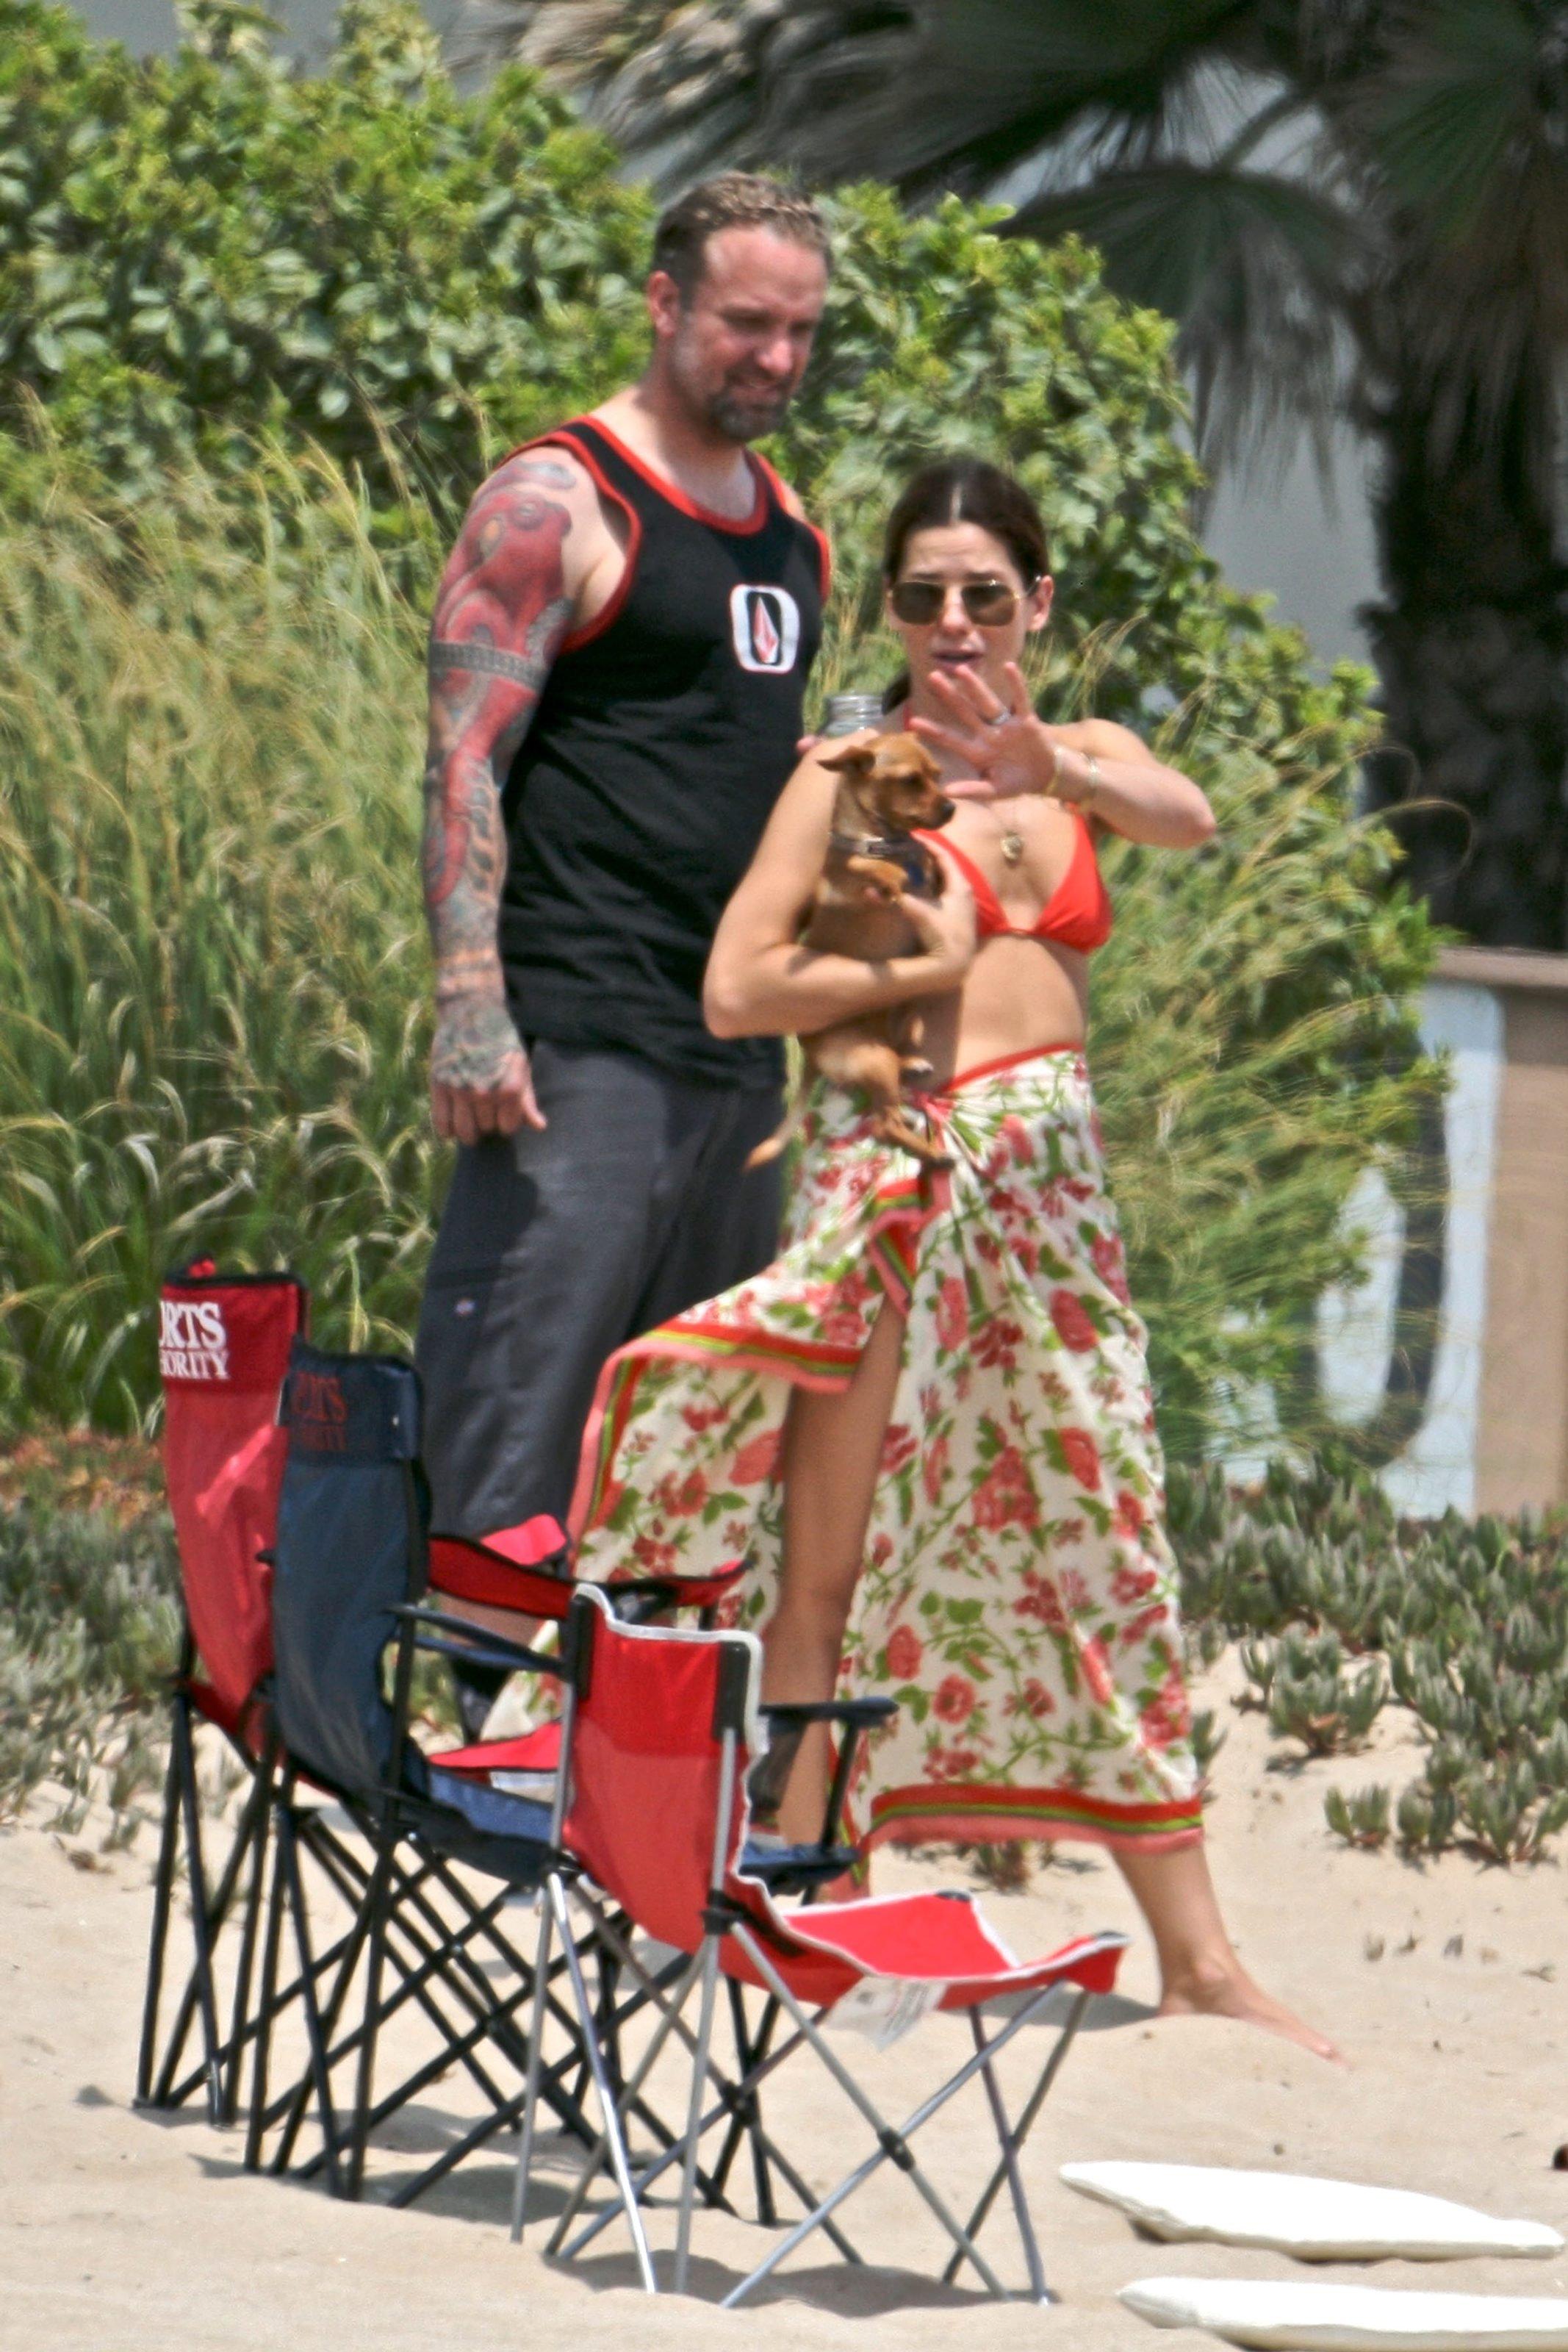 79135_Celebutopia-Sandra_Bullock_in_top_bikini_and_husband_host_an_Independence_Day_beach_party-12_122_499lo.jpg